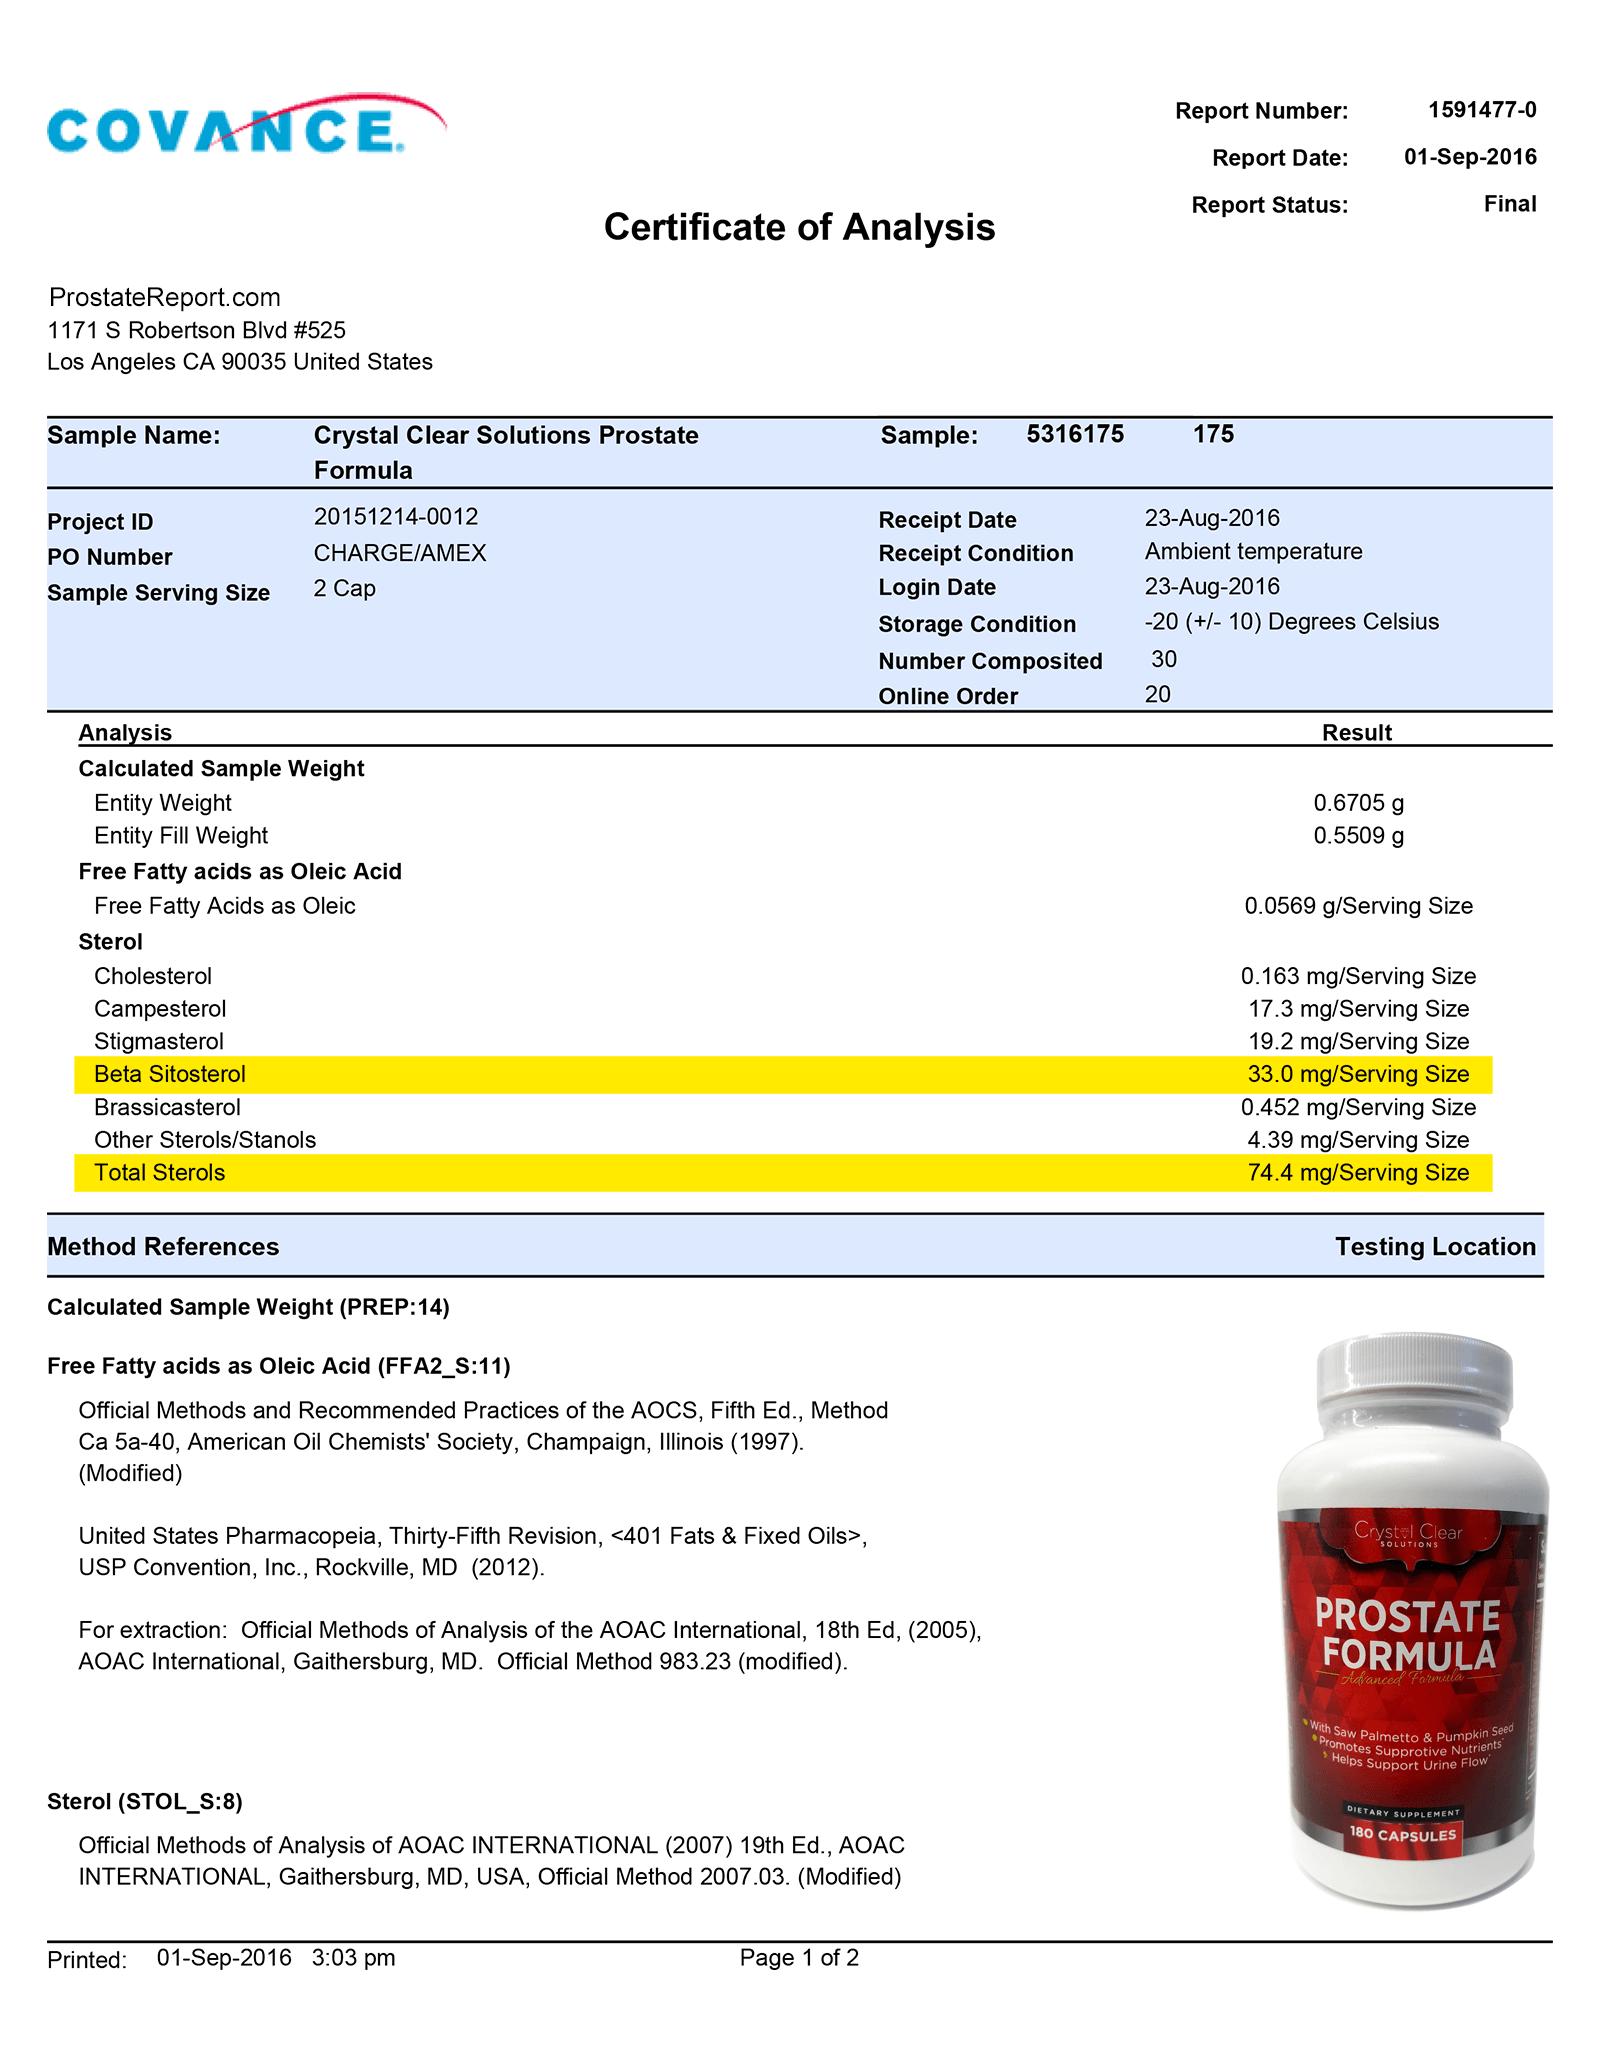 Prostate Formula lab report